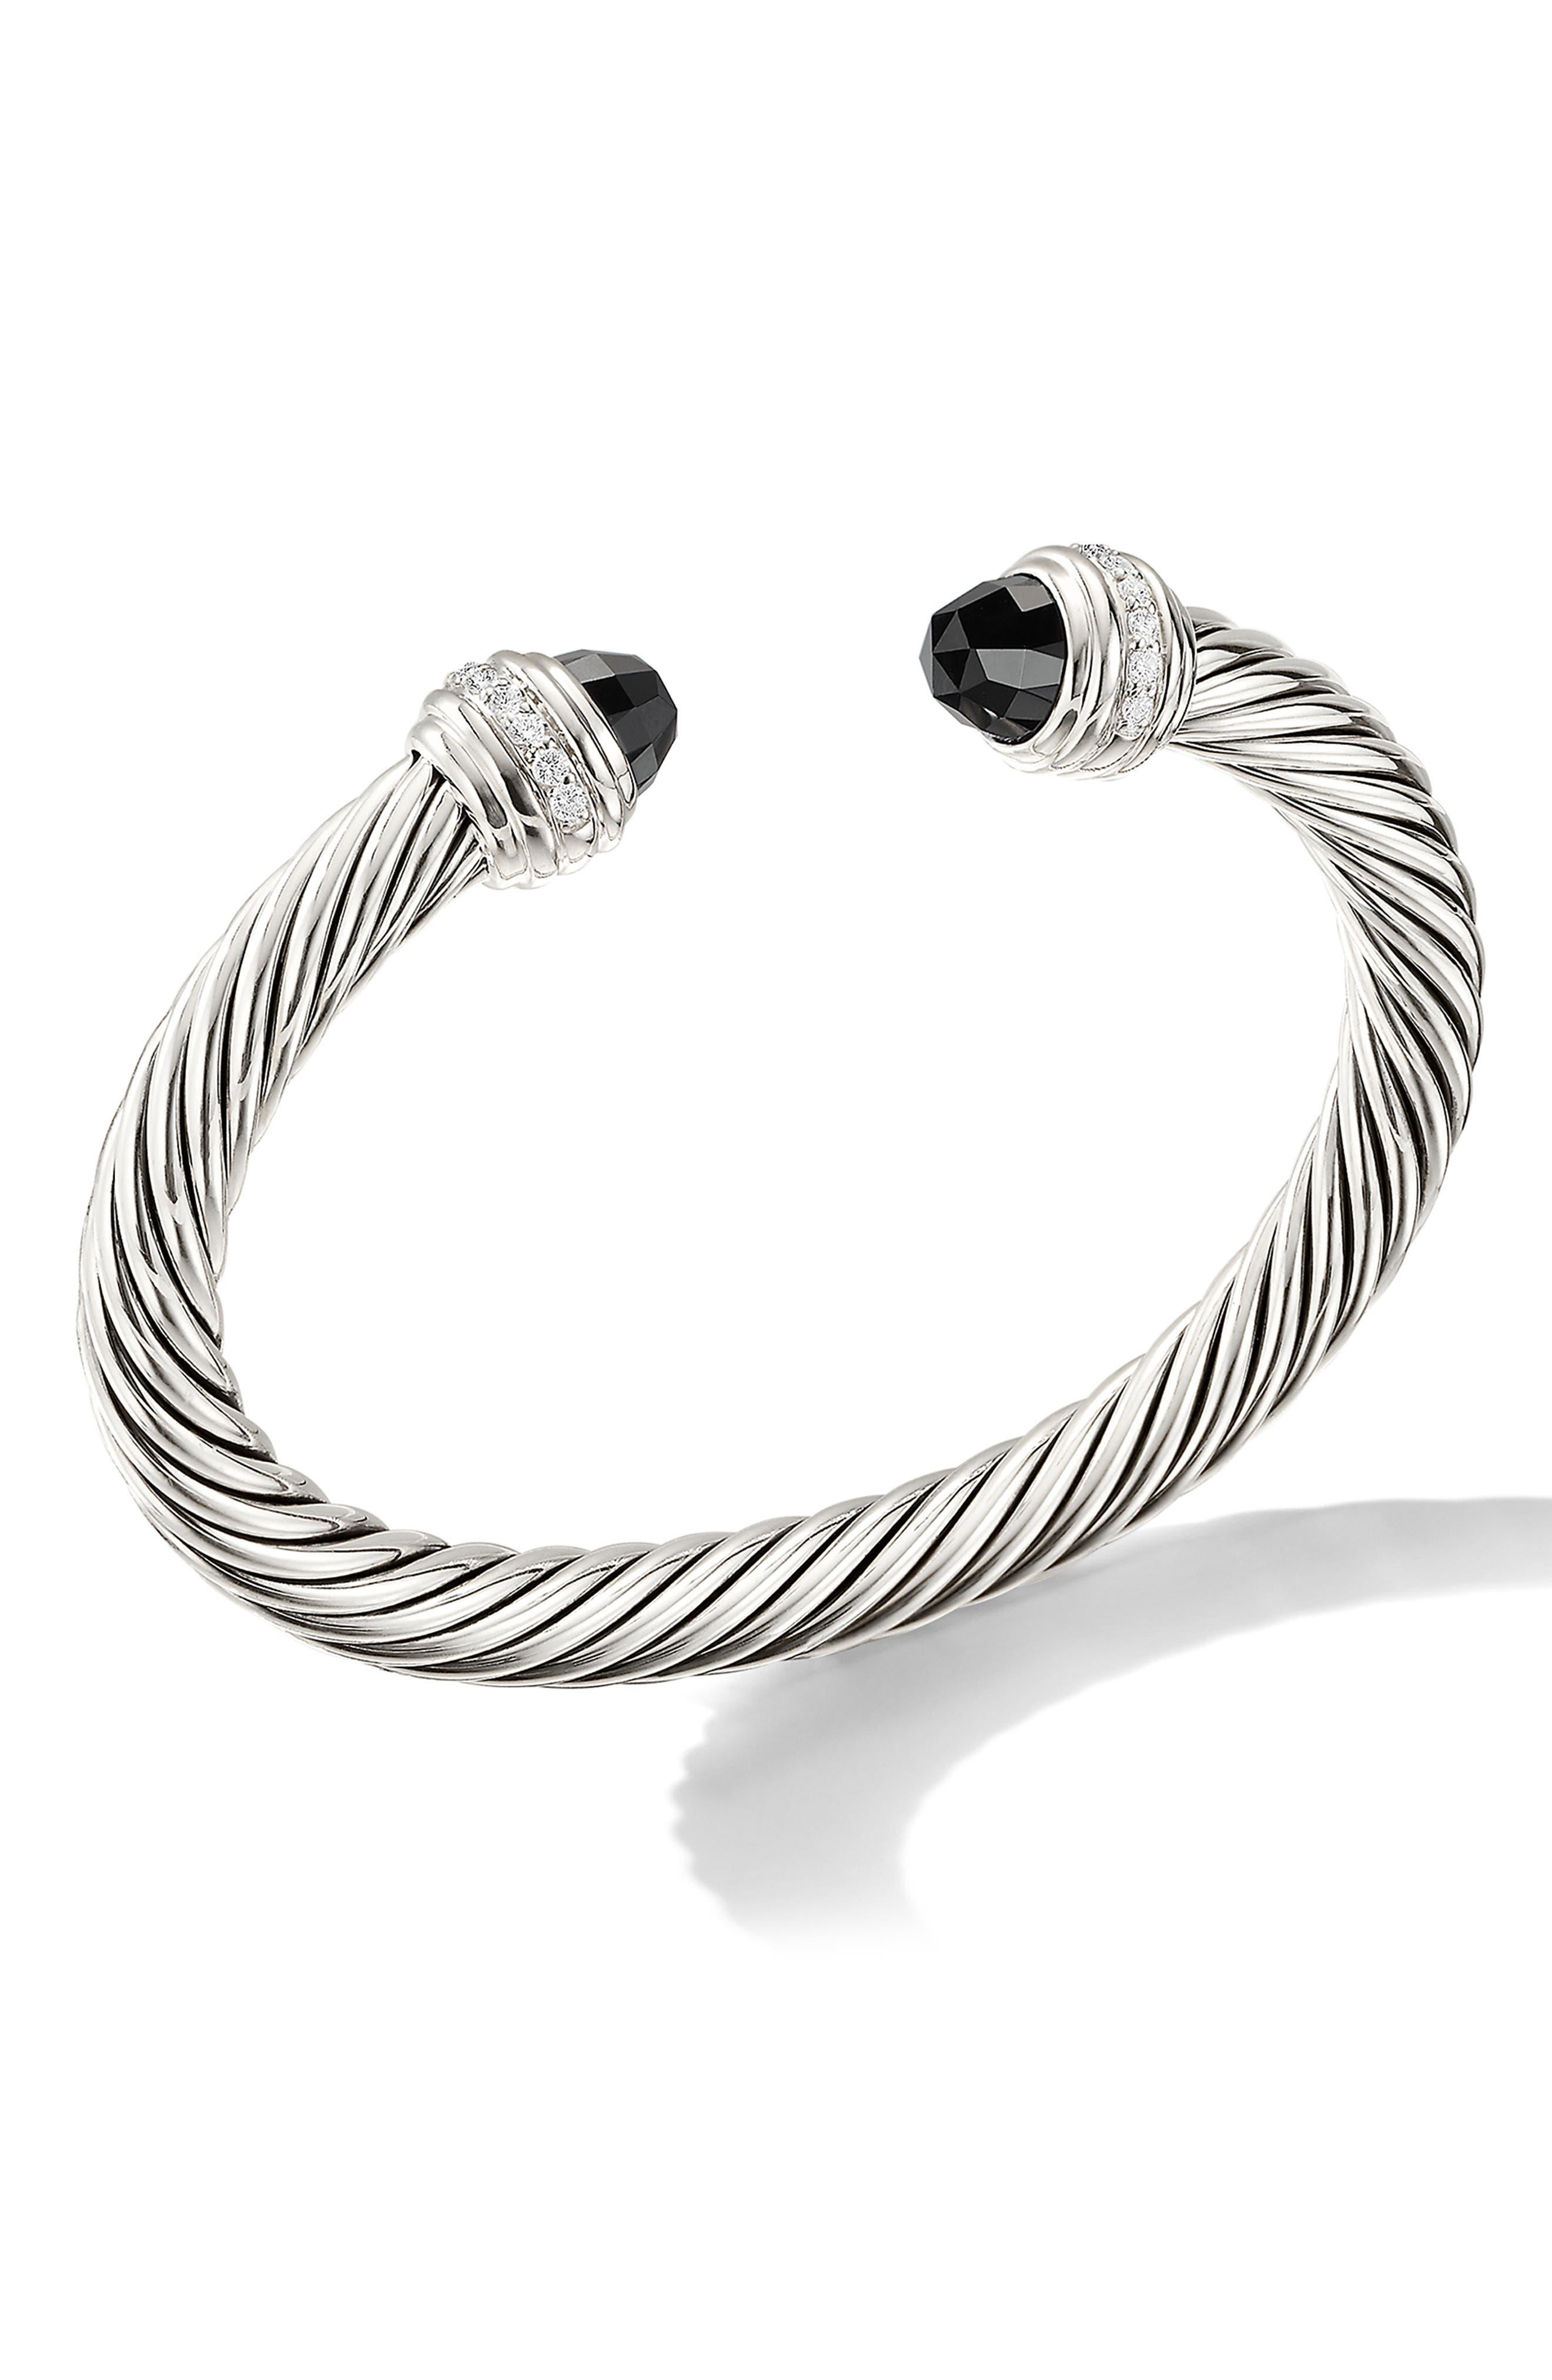 Cable Classics Bracelet with Semiprecious Stones & Diamonds, 7mm, Main, color, SILVER/ DIAMOND/ BLACK ONYX